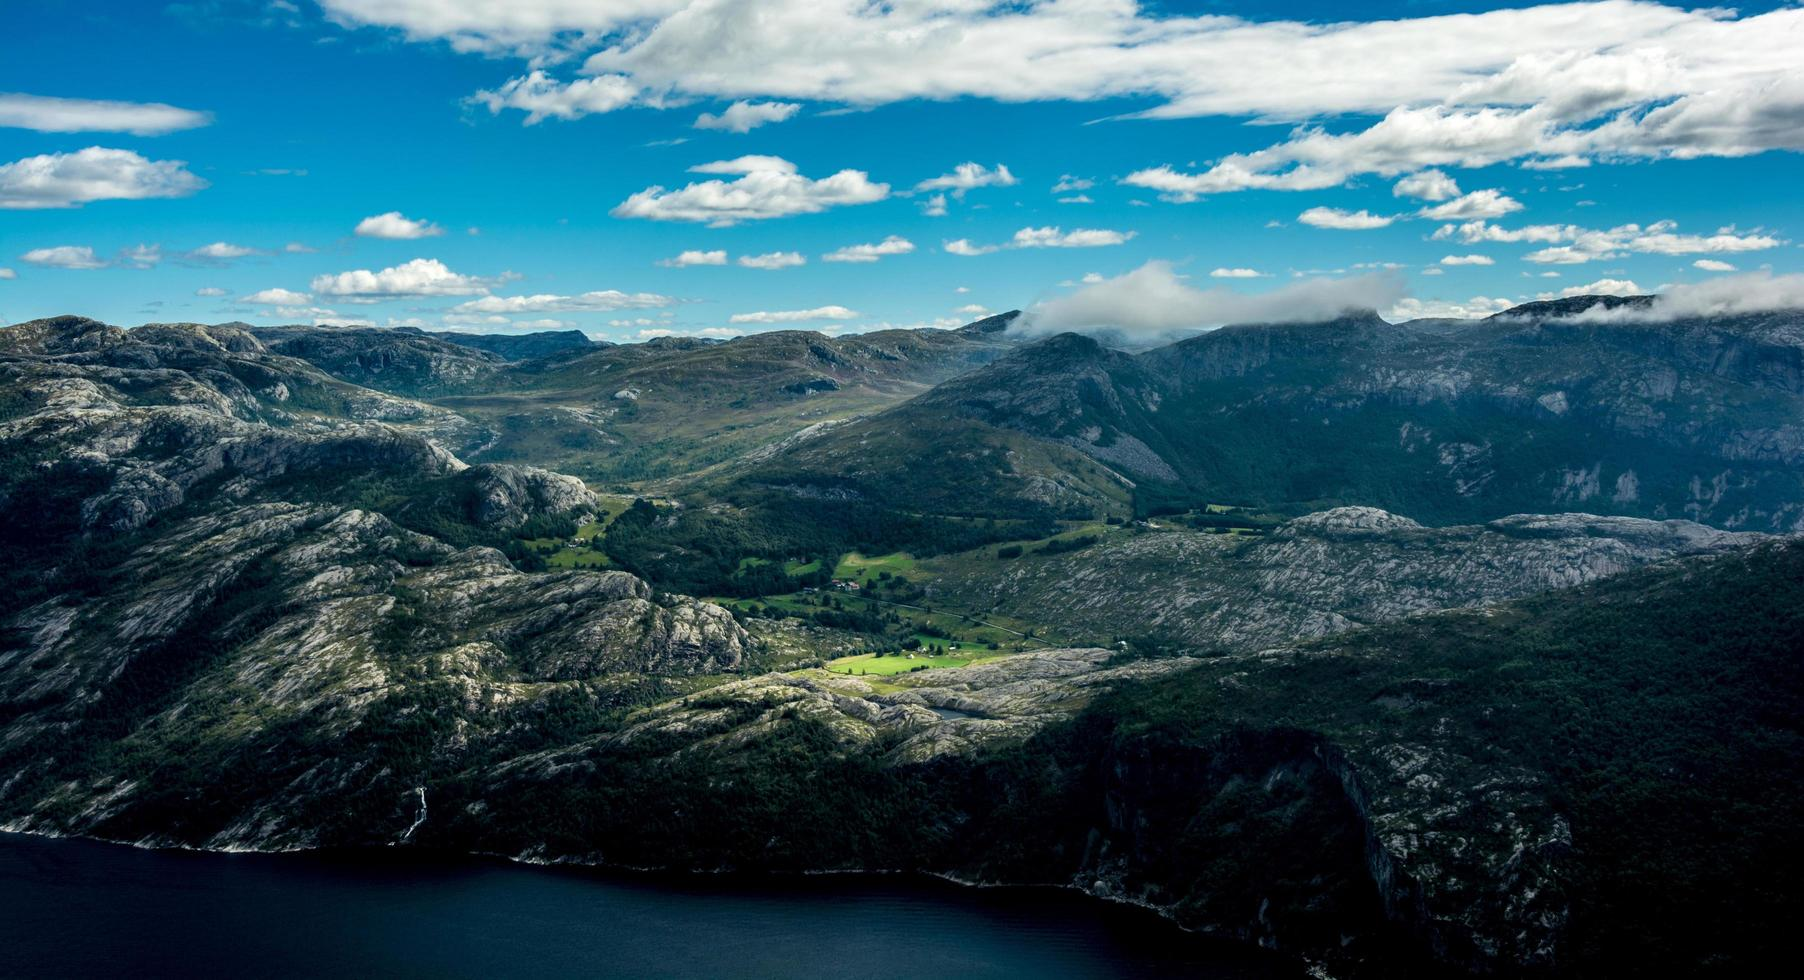 Mountain range in Norway photo